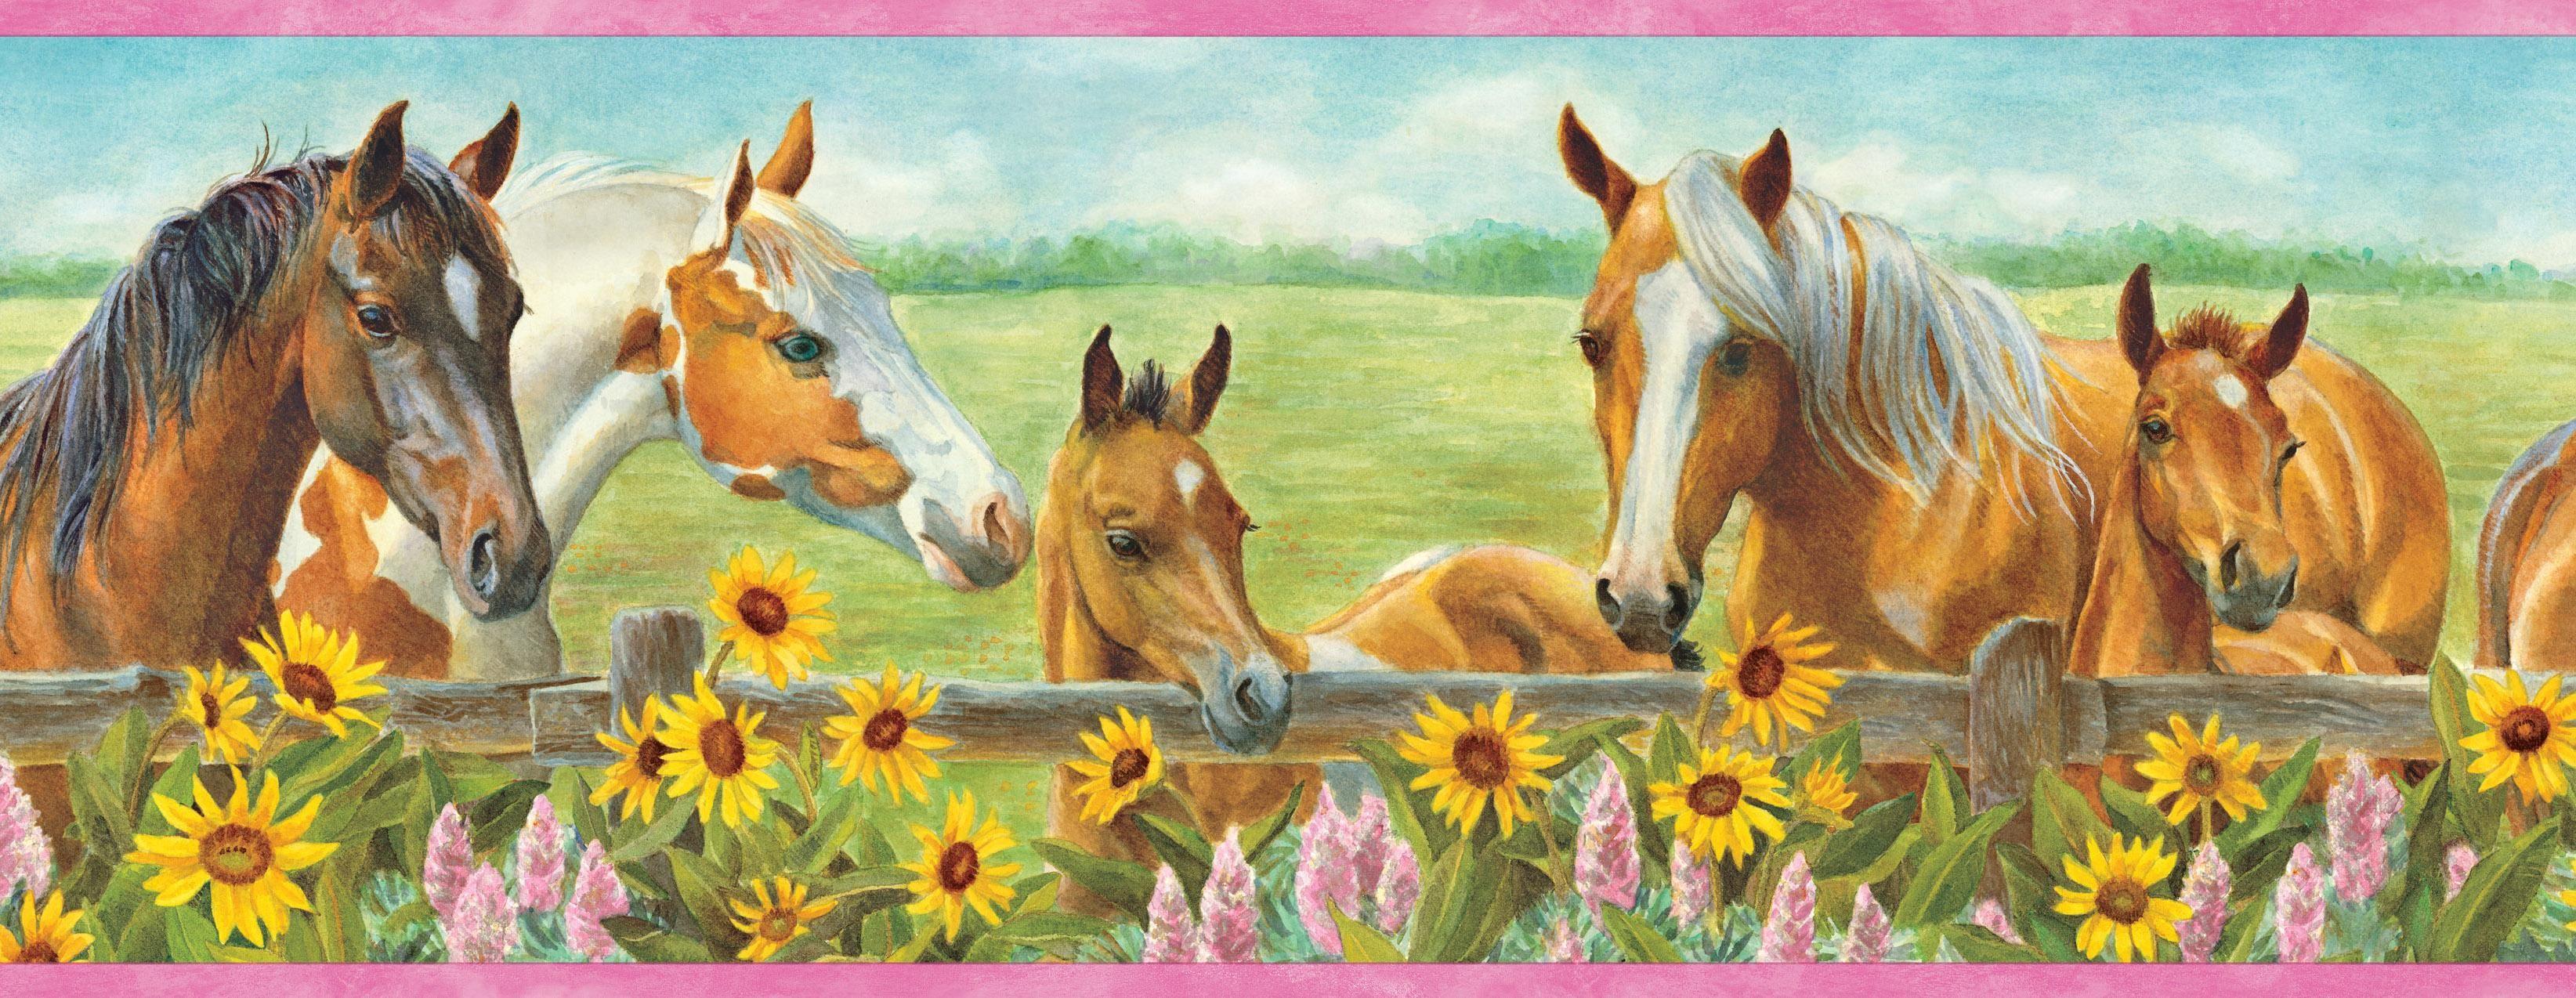 Brewster Wallcovering Harmony Pink Horses Sunflowers Portrait Border Wallpaper Horse Wallpaper Border Horse Wallpaper Wallpaper Border